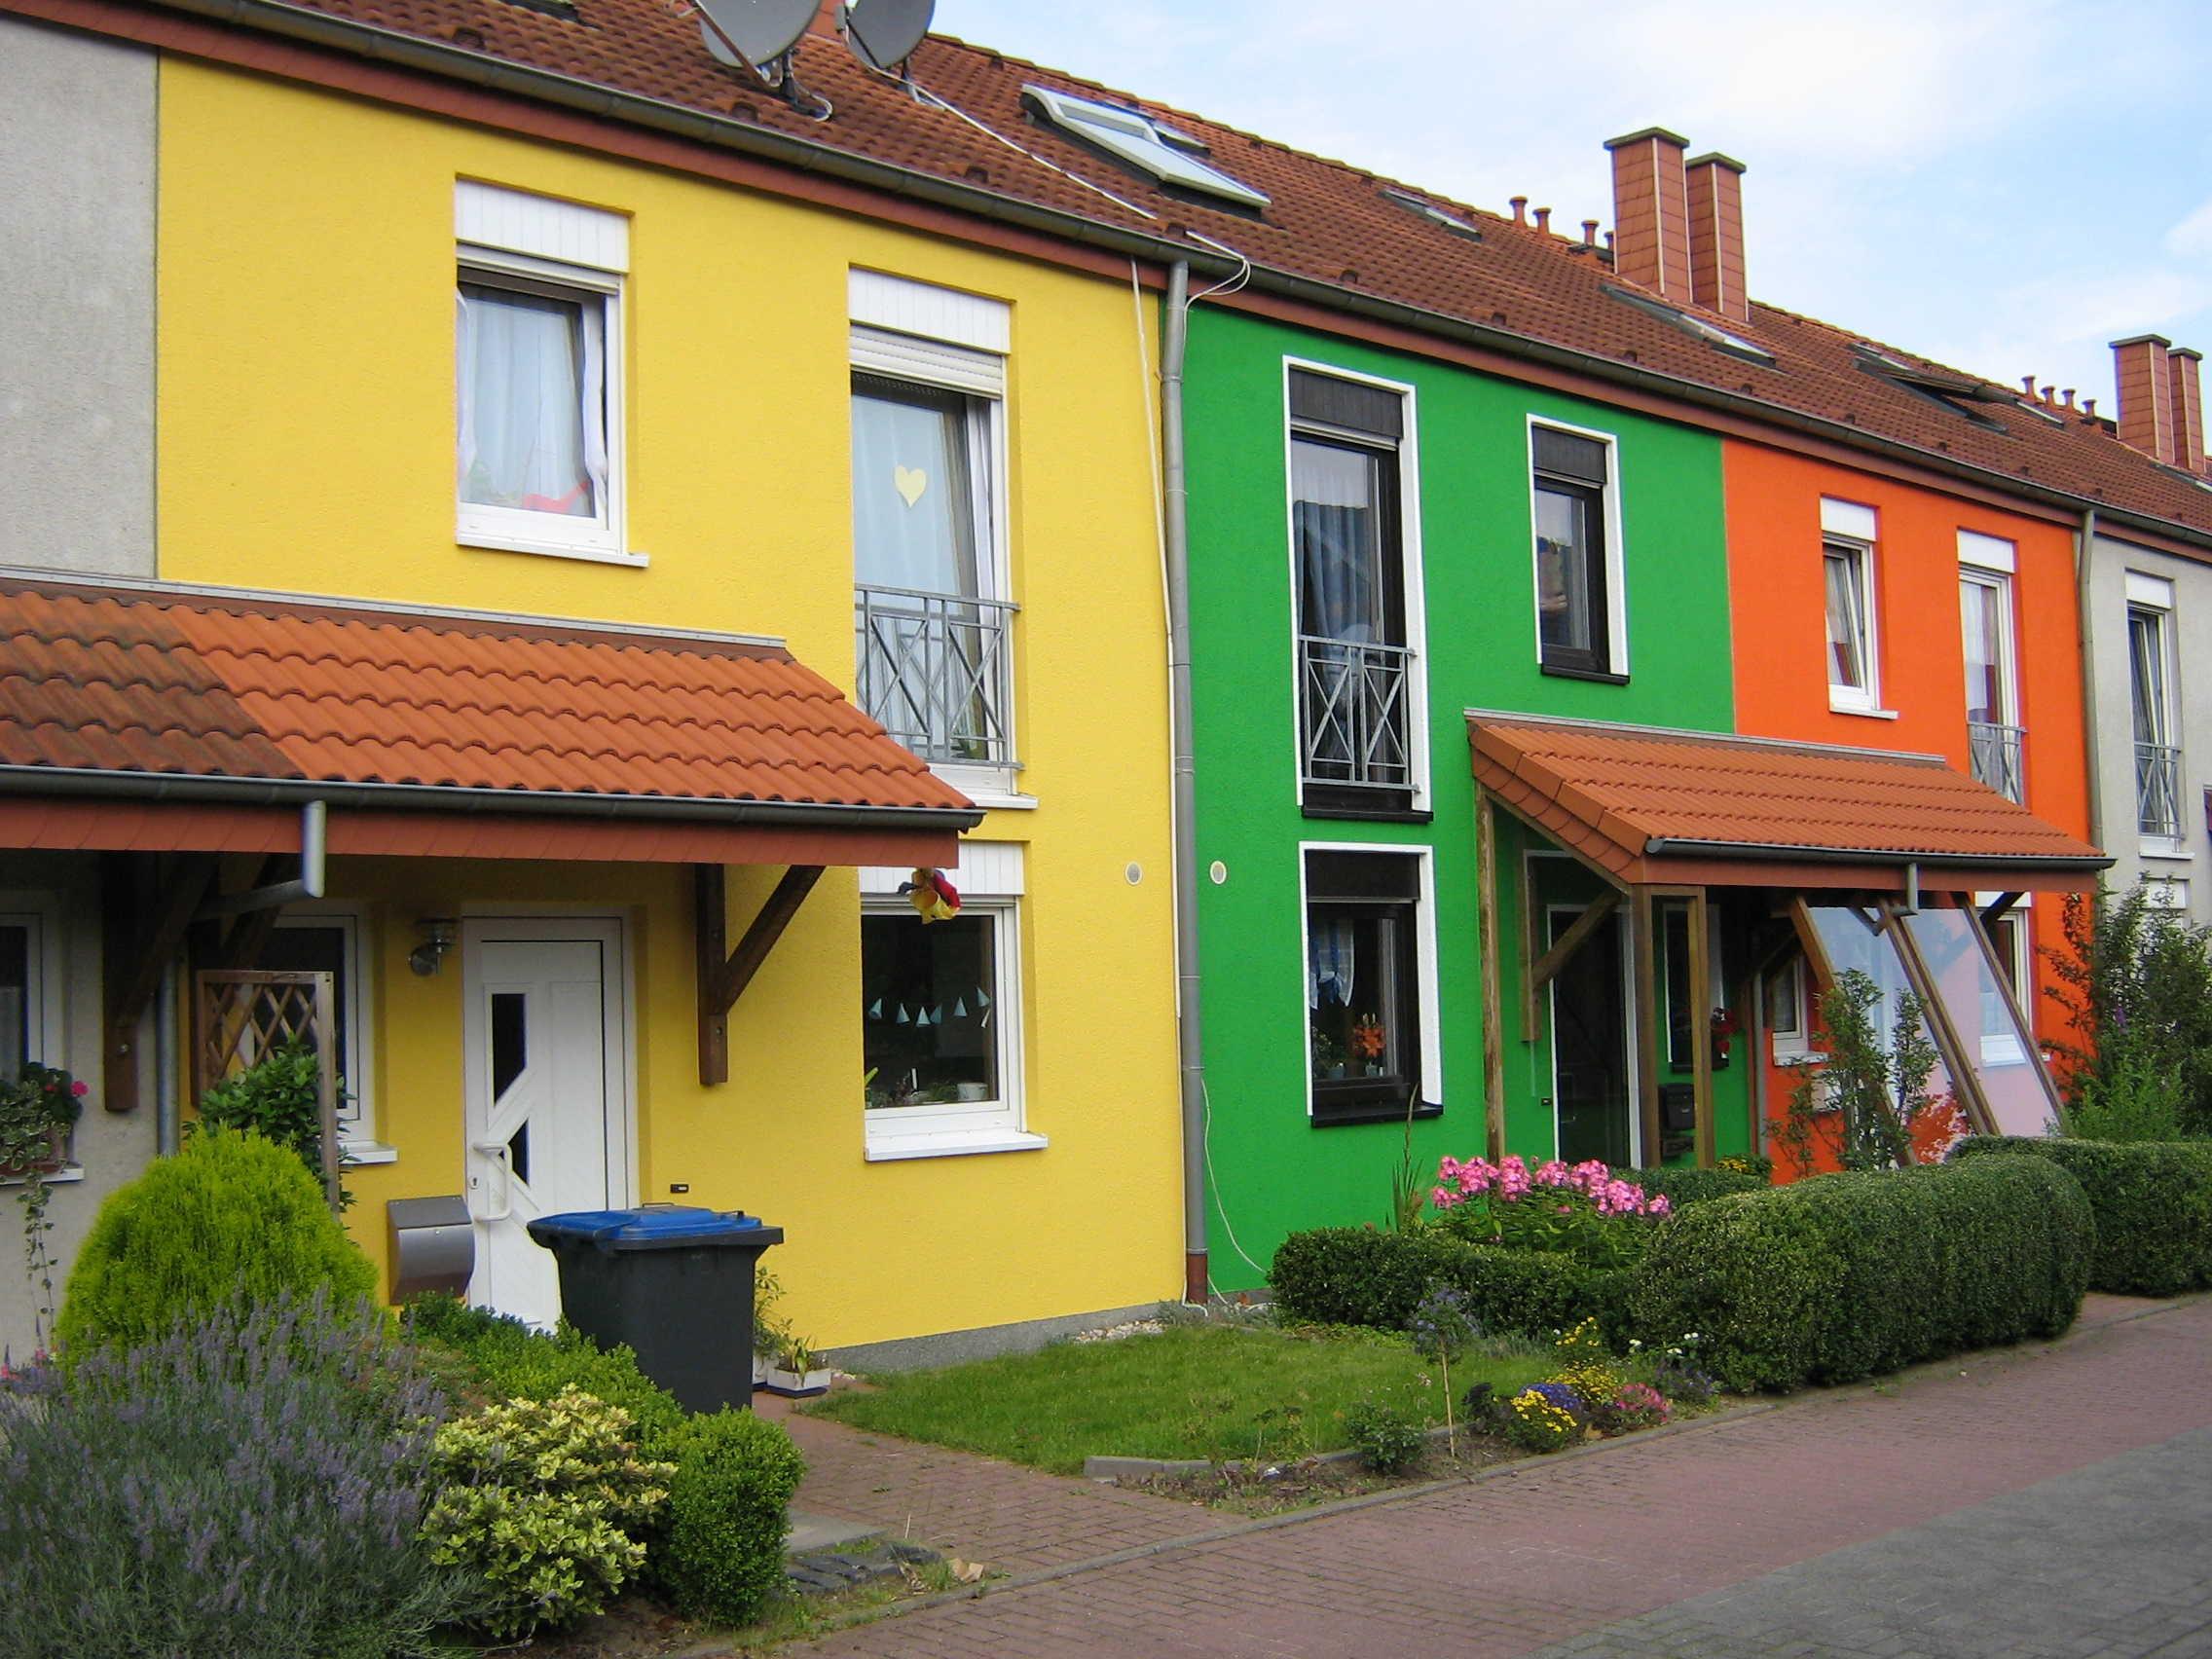 Покрасить фасад дома: правила нанесения краски, критерии ее выбора